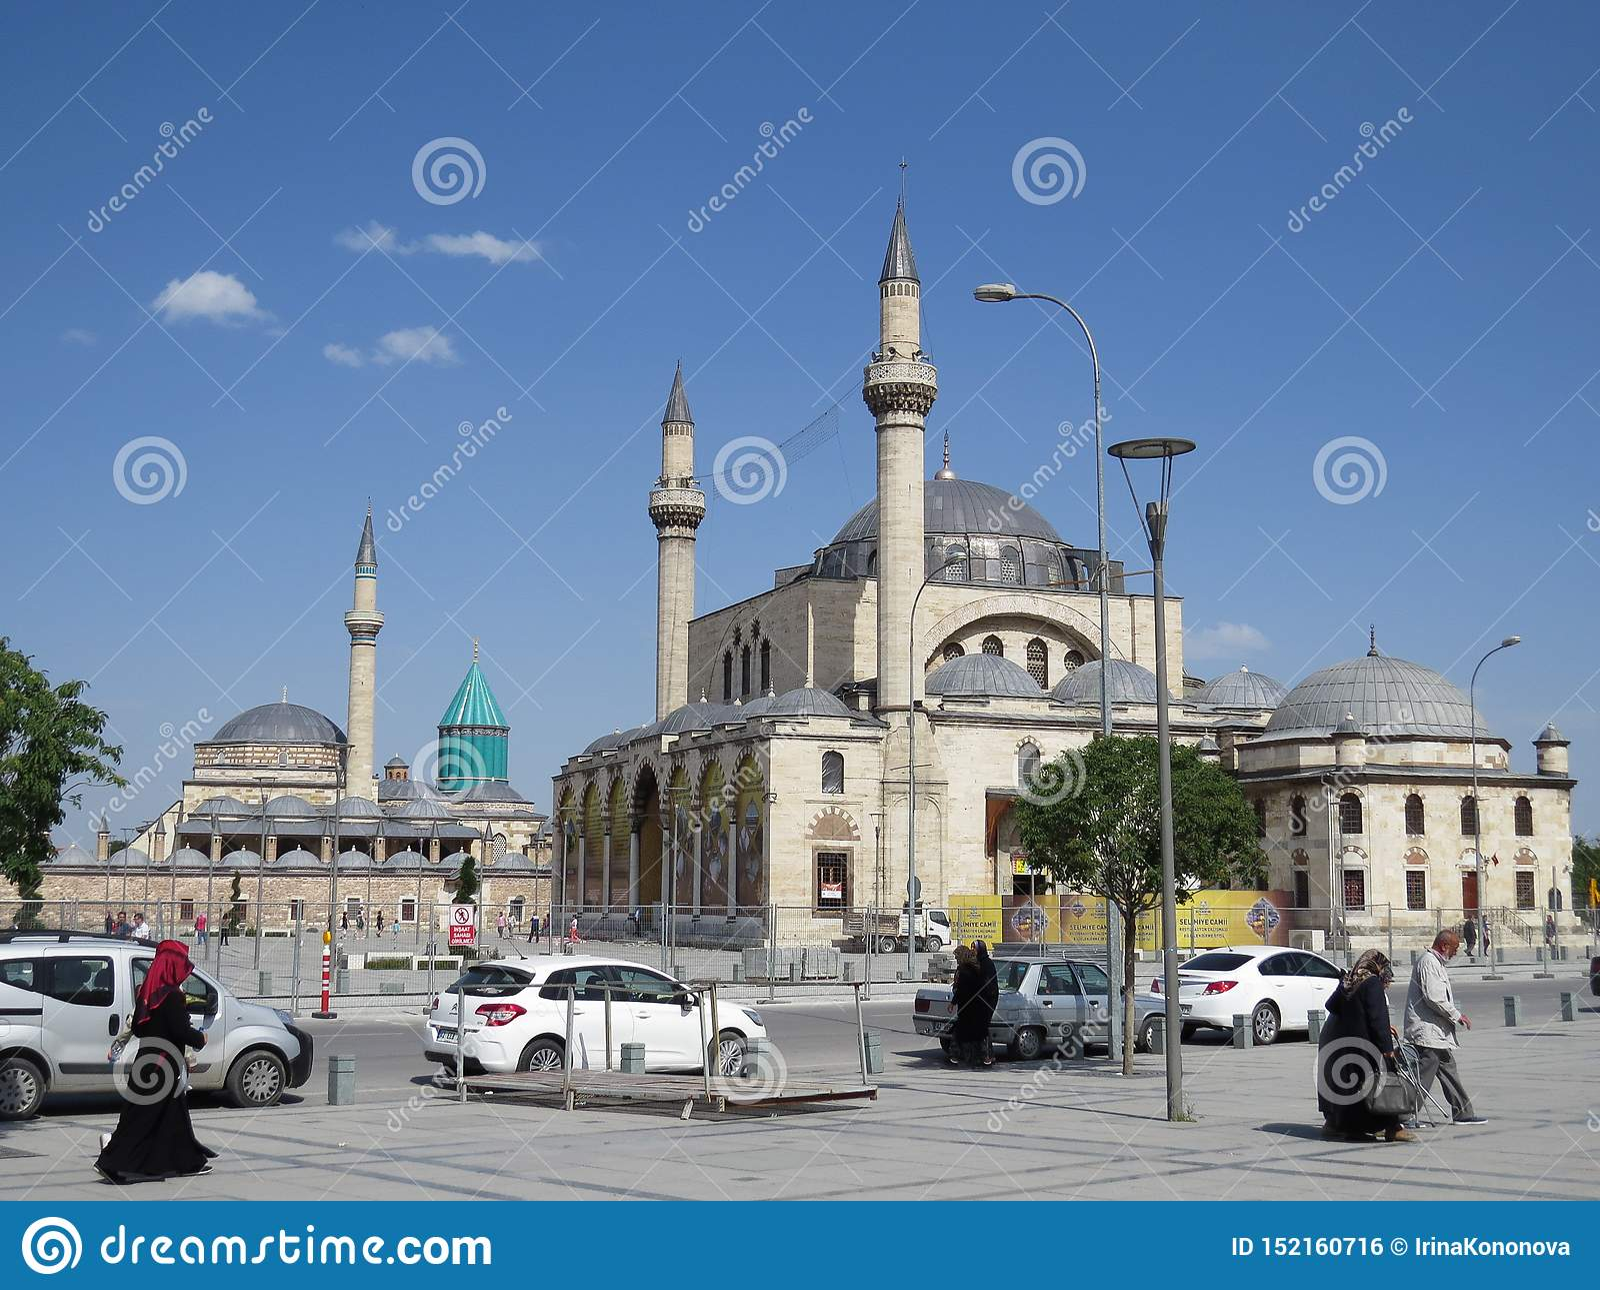 Selimiye是一个半球形的清真寺建造在苏丹塞利姆二世下在1566和1574之间